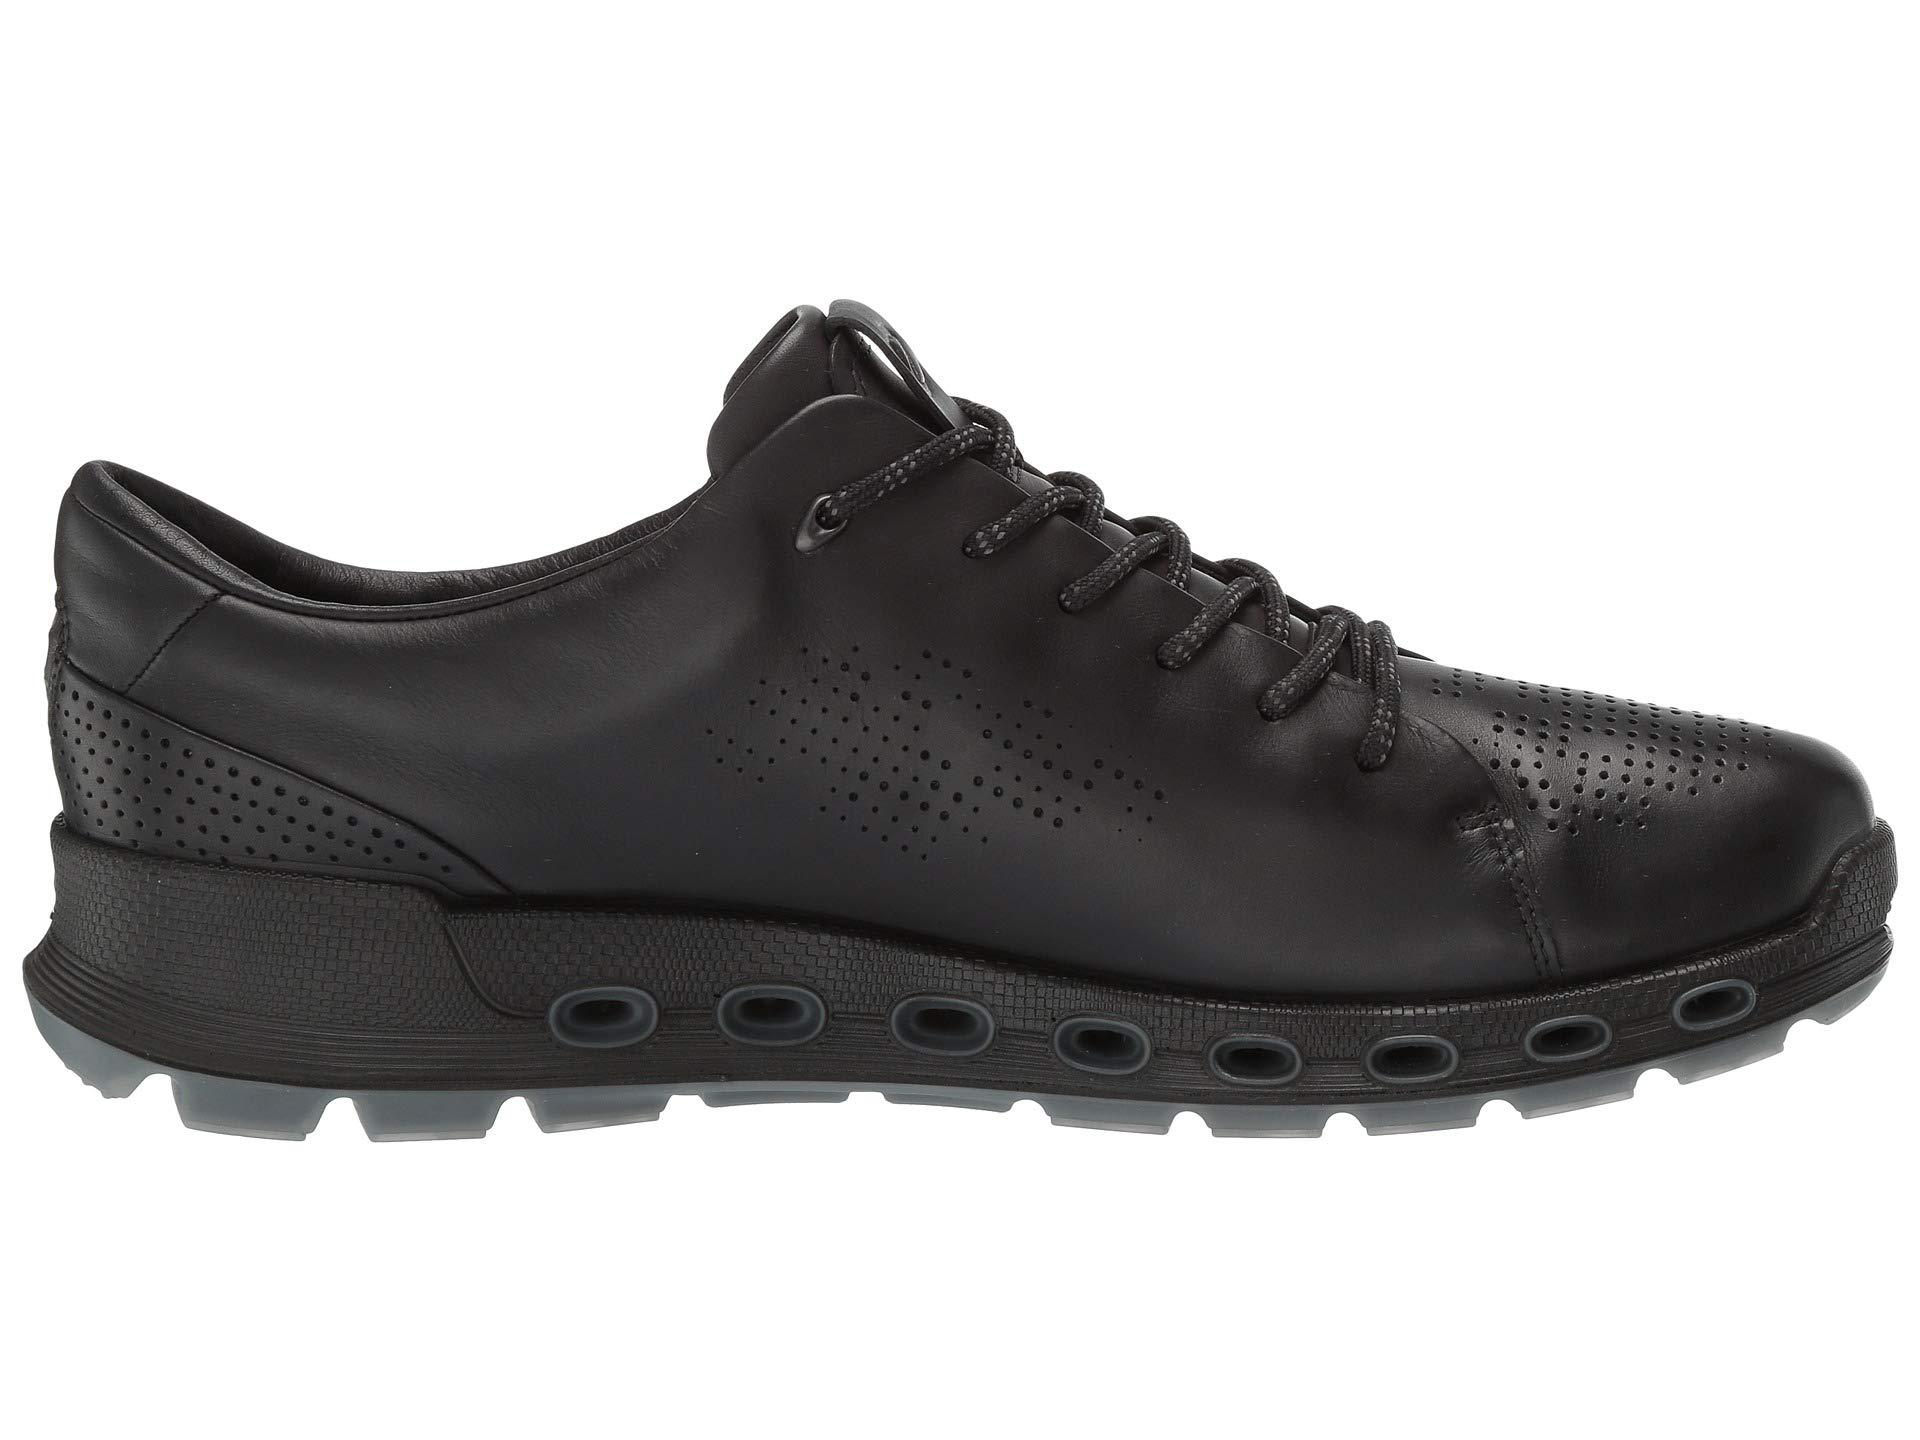 b070c9113 Ecco Cool 2.0 Retro Sneaker (mink) Men s Shoes in Black for Men - Lyst